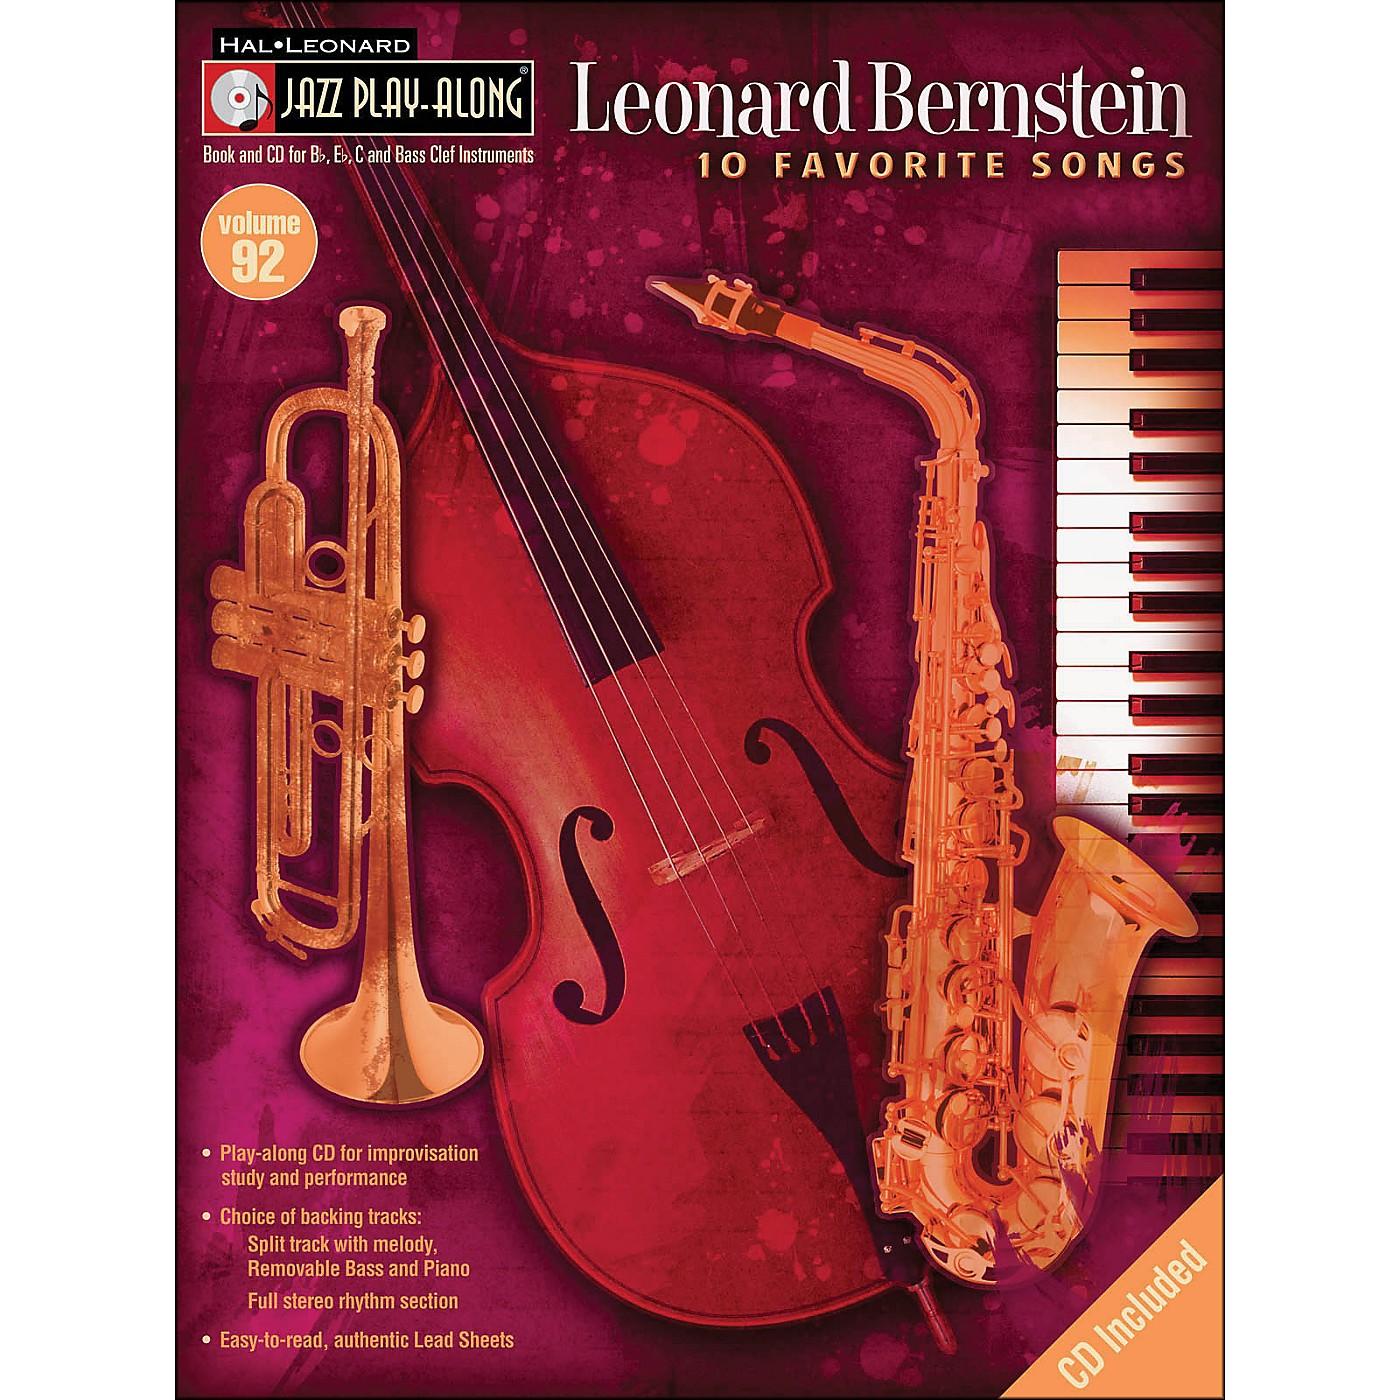 Hal Leonard Leonard Bernstein Jazz Play-Along Volume 92 Book/CD thumbnail